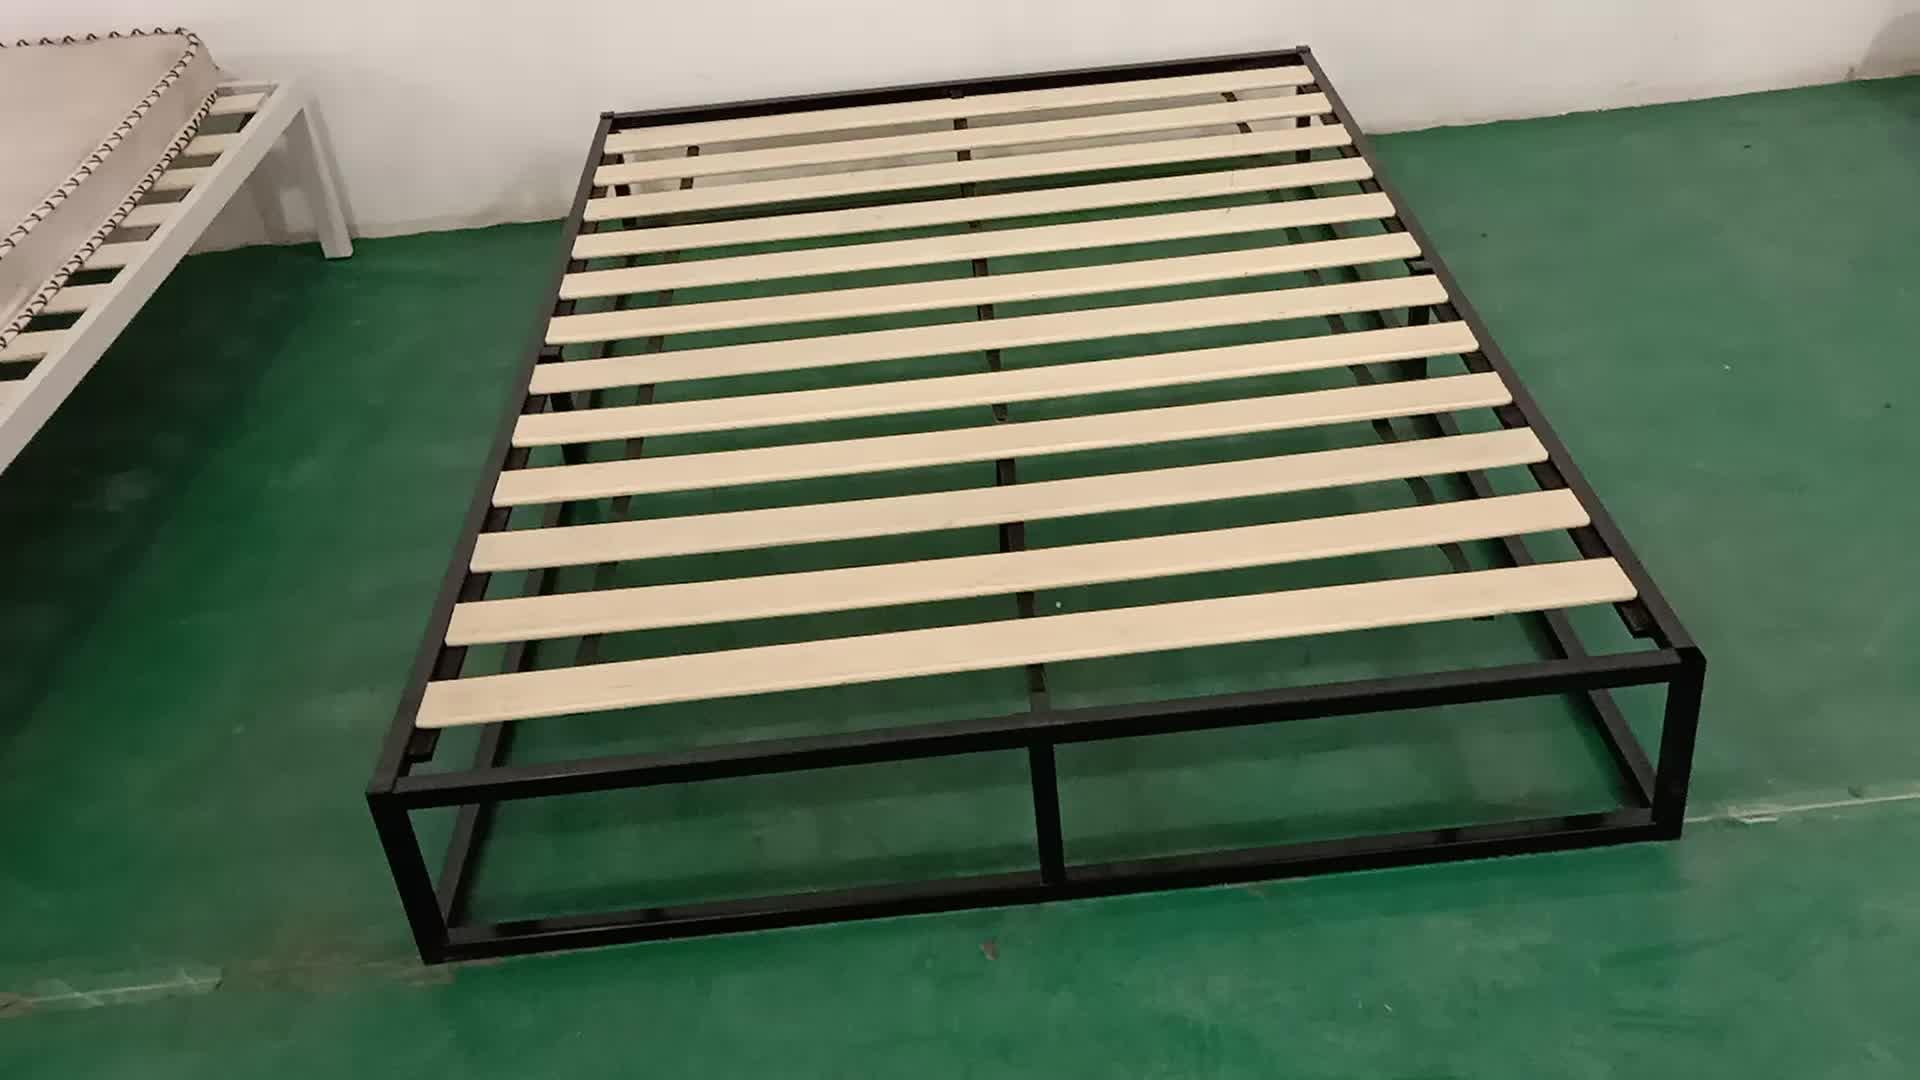 Modern Studio Platform Bed Frame / Mattress Foundation / Boxspring Optional / Wood slats support